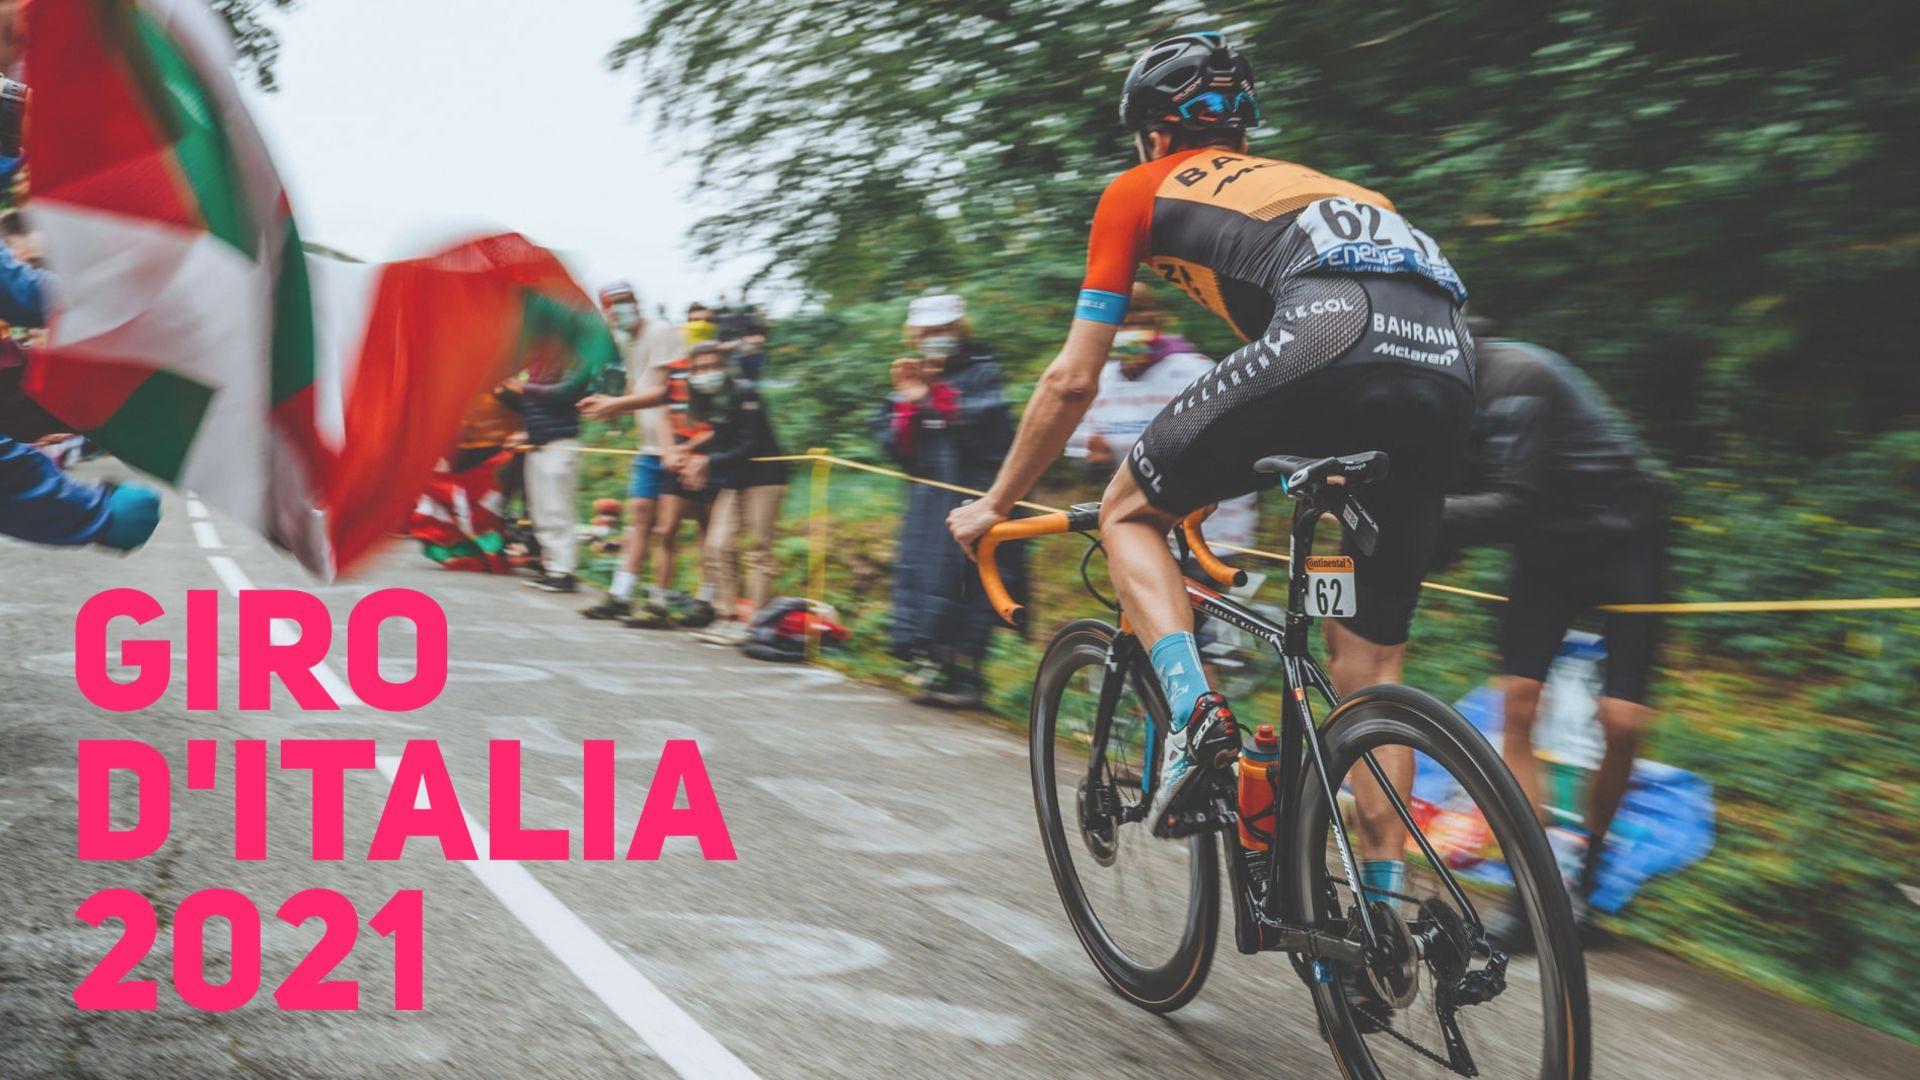 Giro d'Italia, Mikel Landa, rowery Merida, Bahrain Victorious